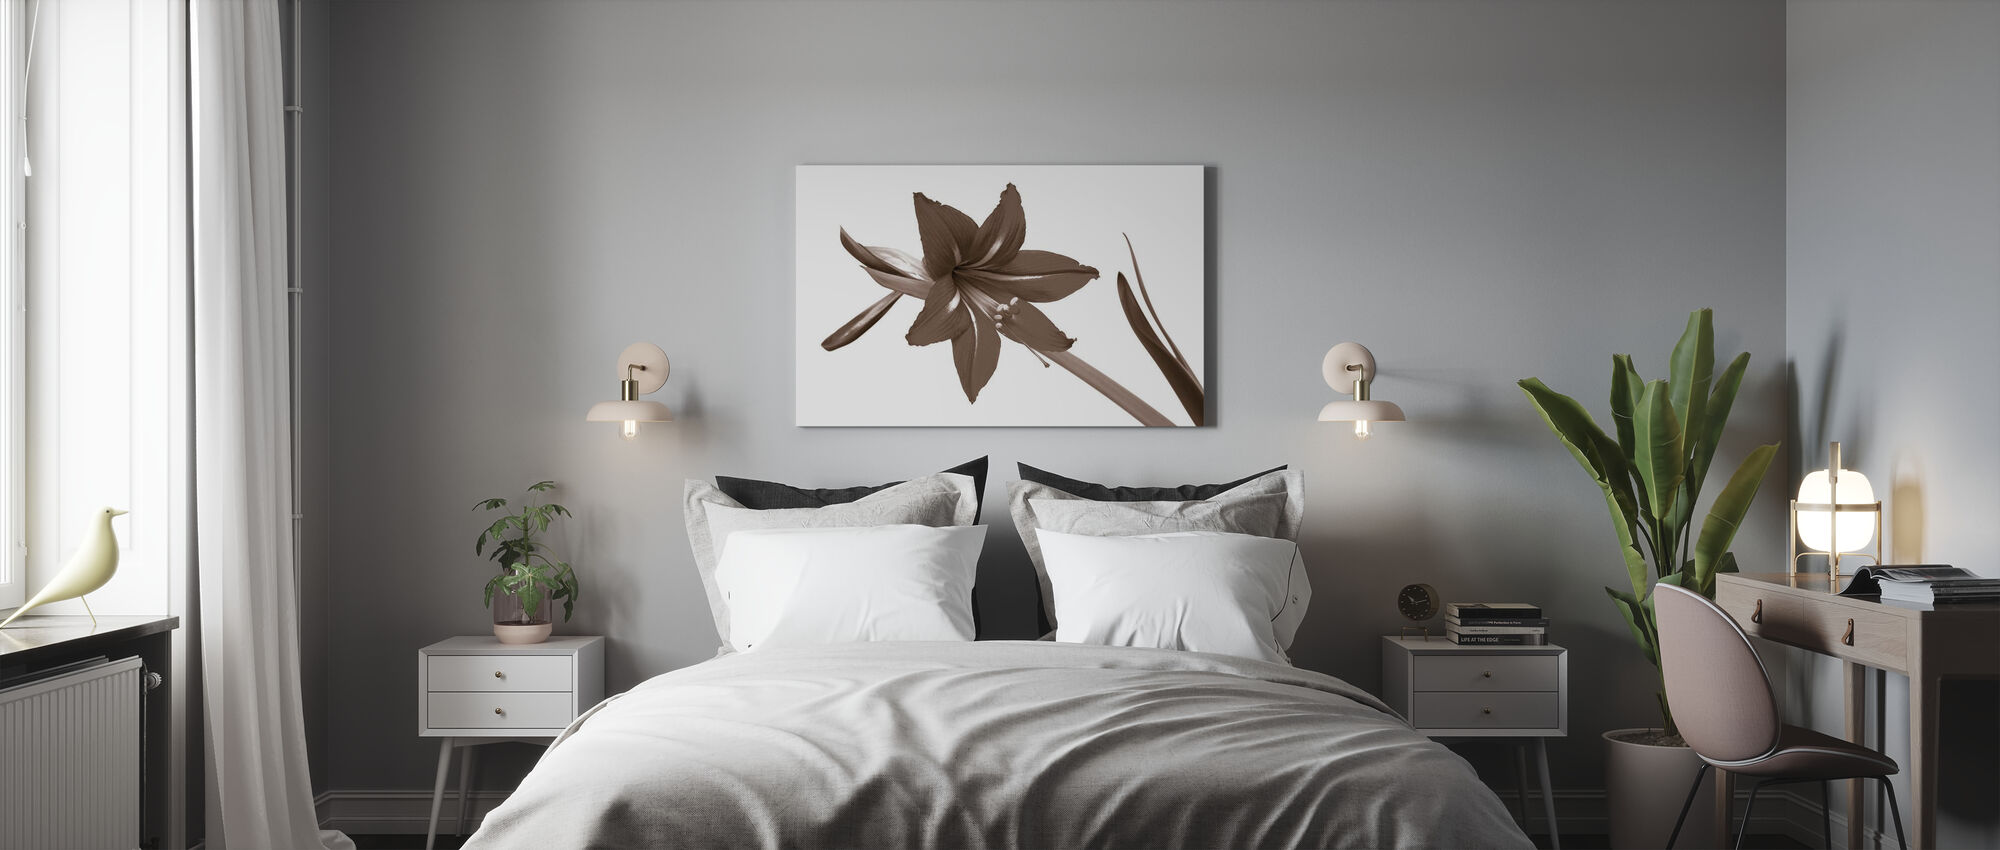 Punainen Lilja - Sepia - Canvastaulu - Makuuhuone